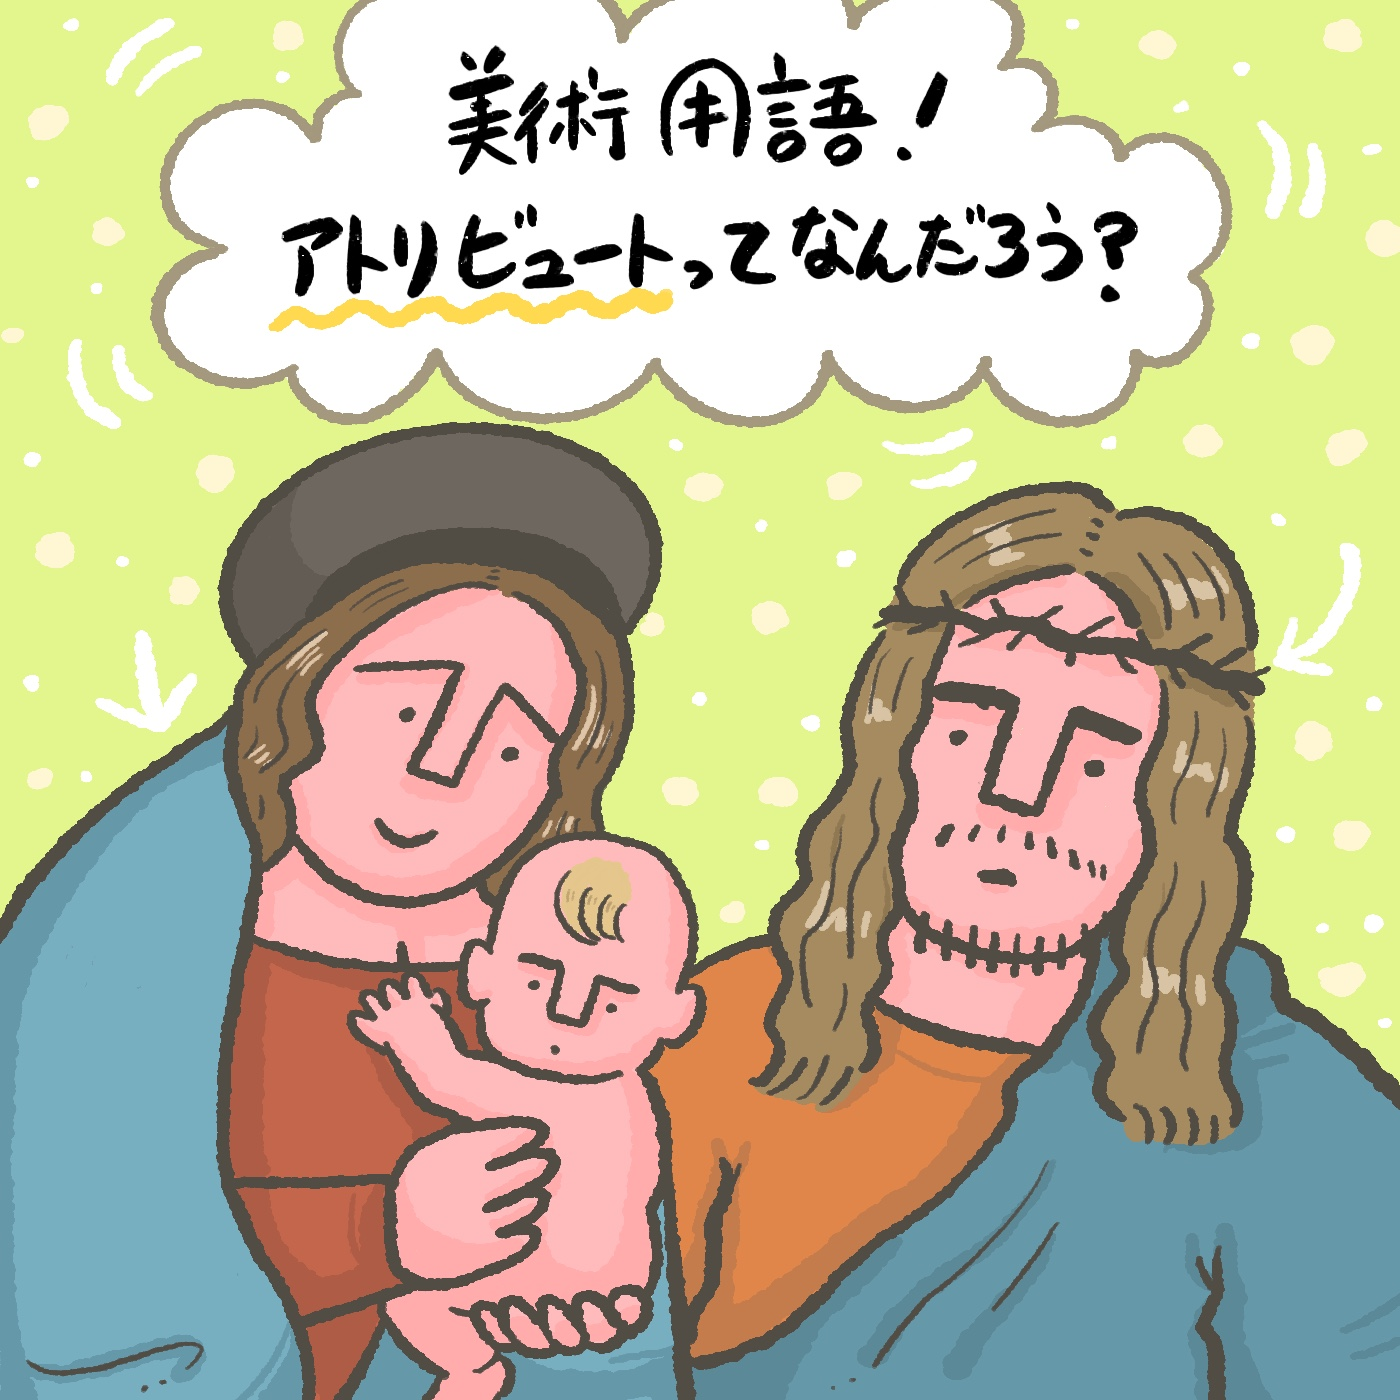 OBIKAKE ナニソレ アトリビュート 藤野遼太